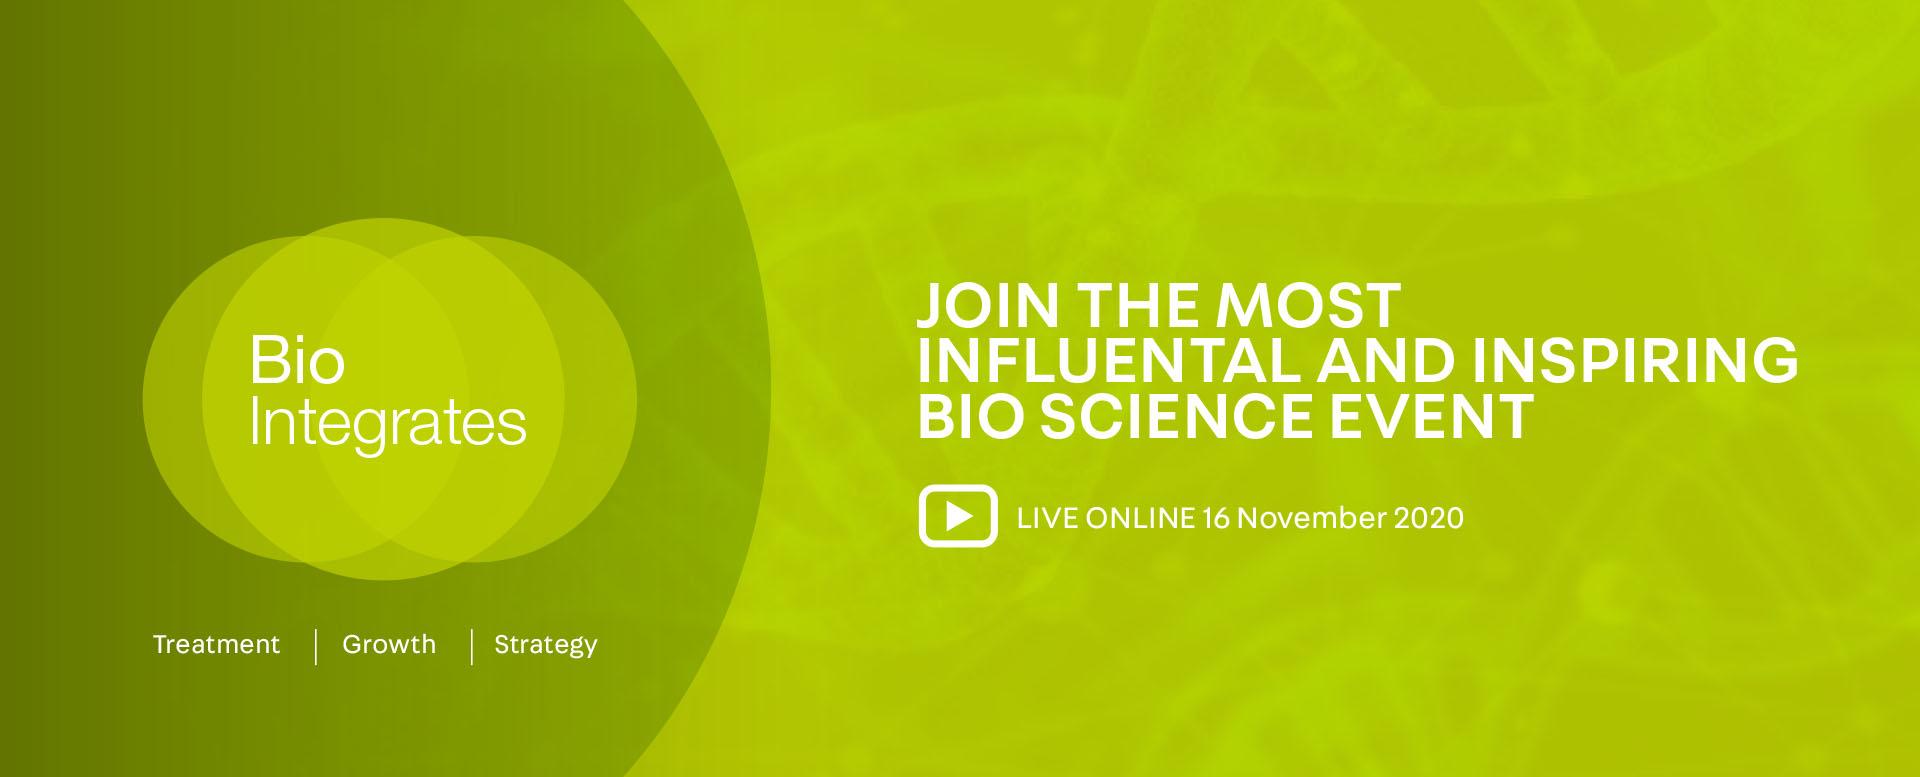 Bio Integrates 2020, 16th November 2020, Leonardo Royal Hotel London Tower Bridge